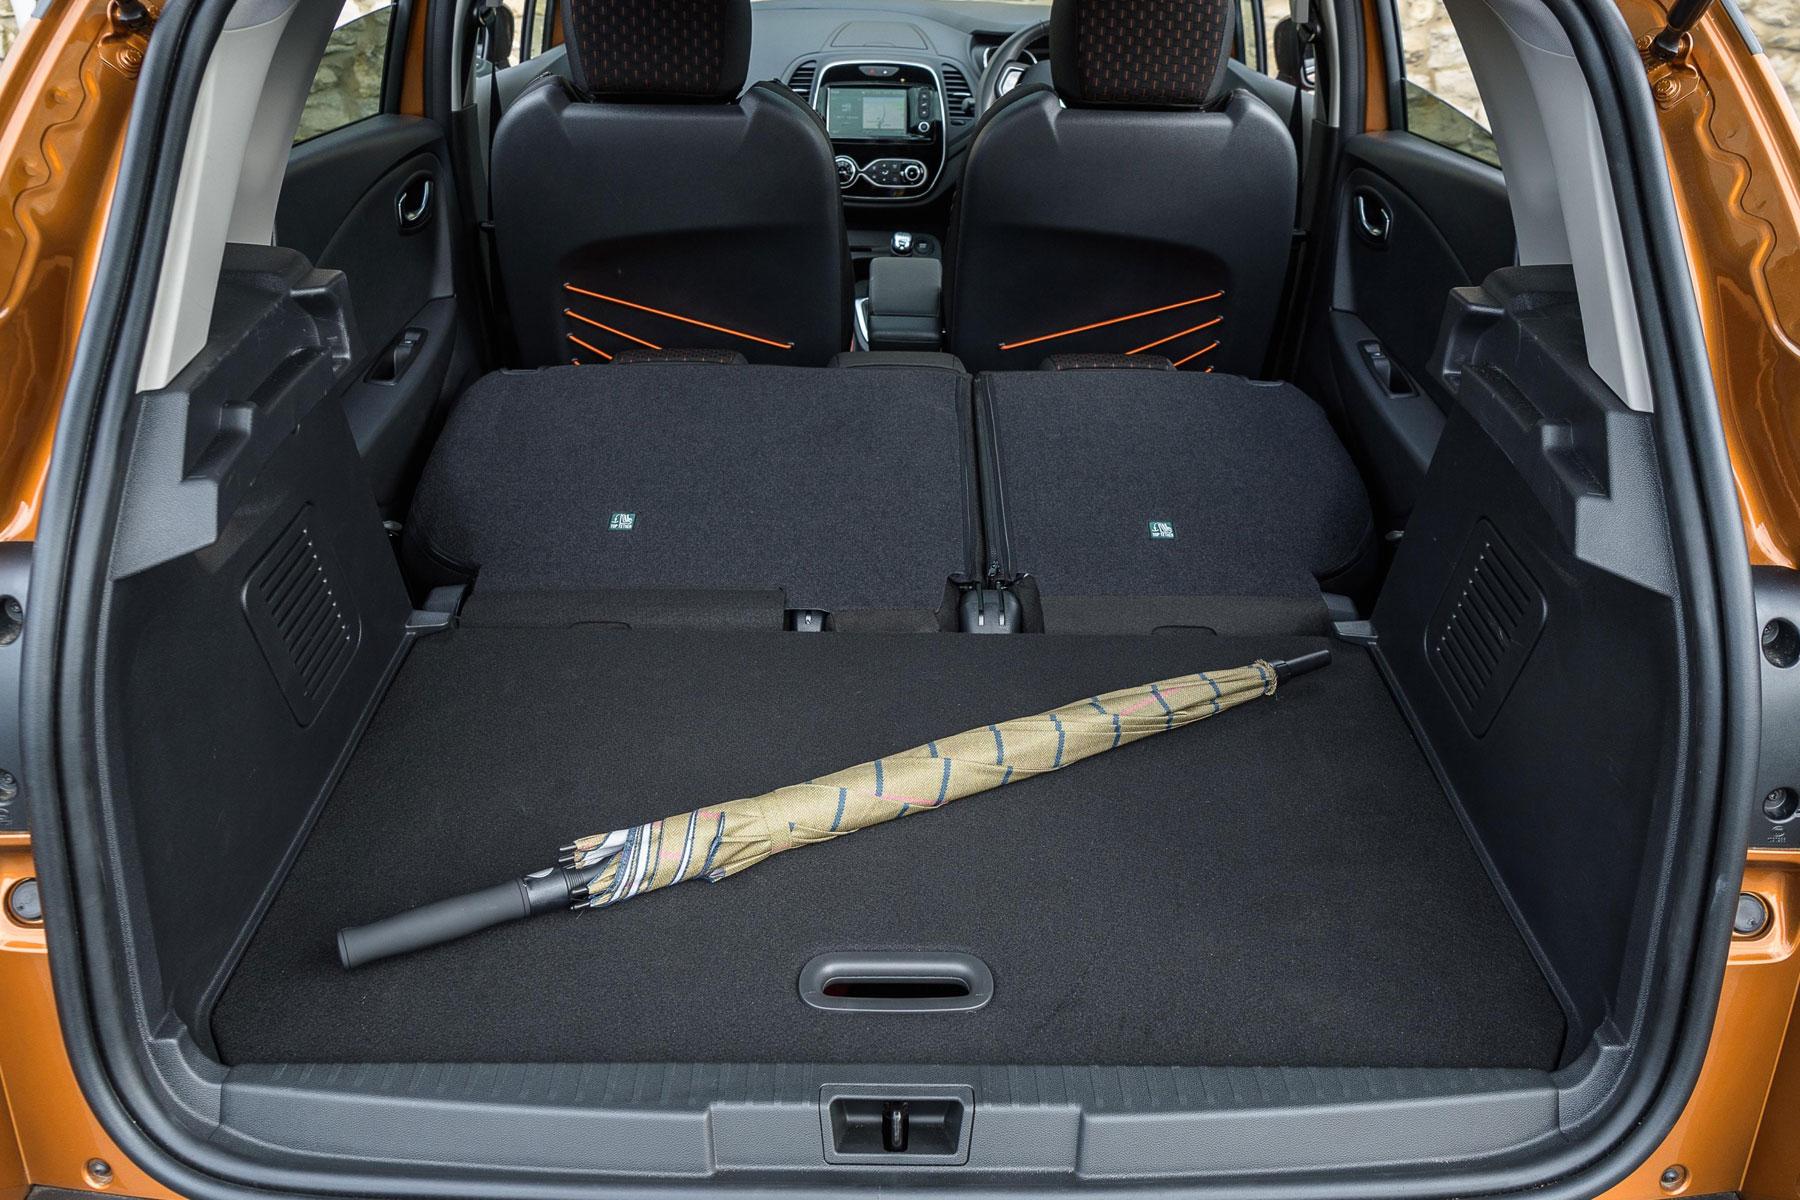 New Renault Captur boot space